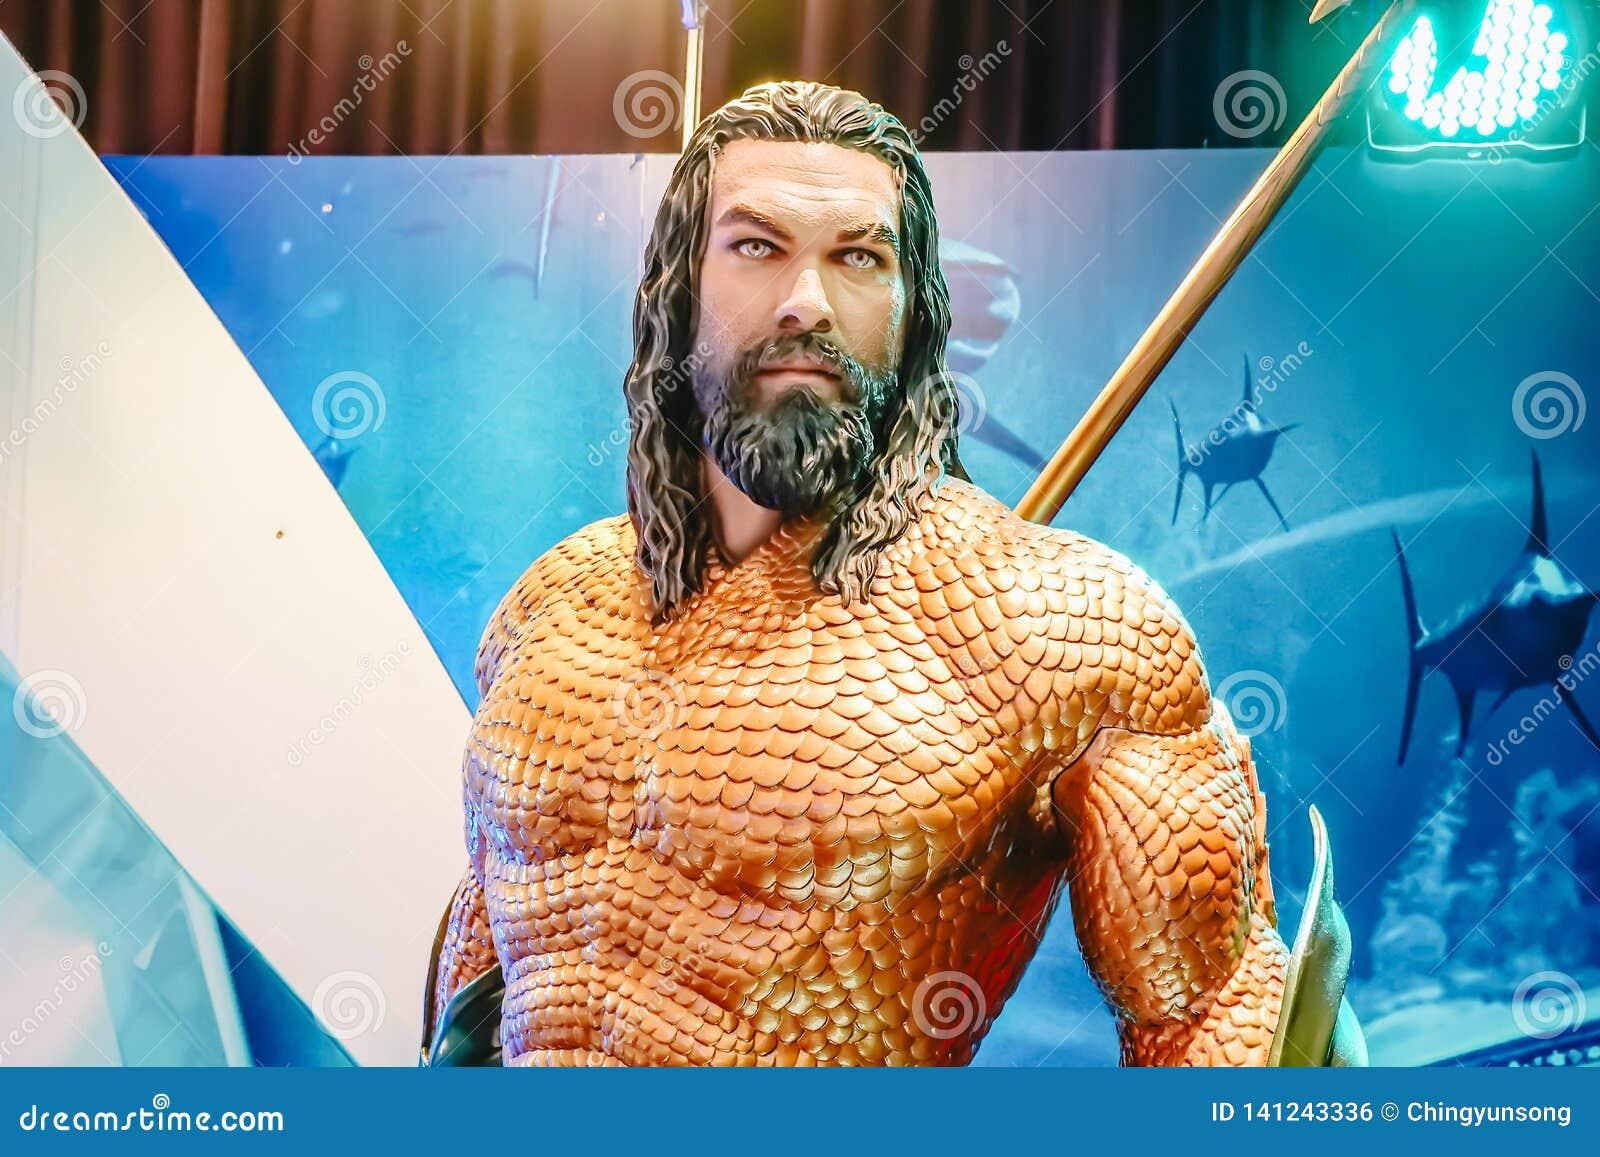 Human Size Statue Of A Dc Comic Superhero Arthur Curry Or Aquaman